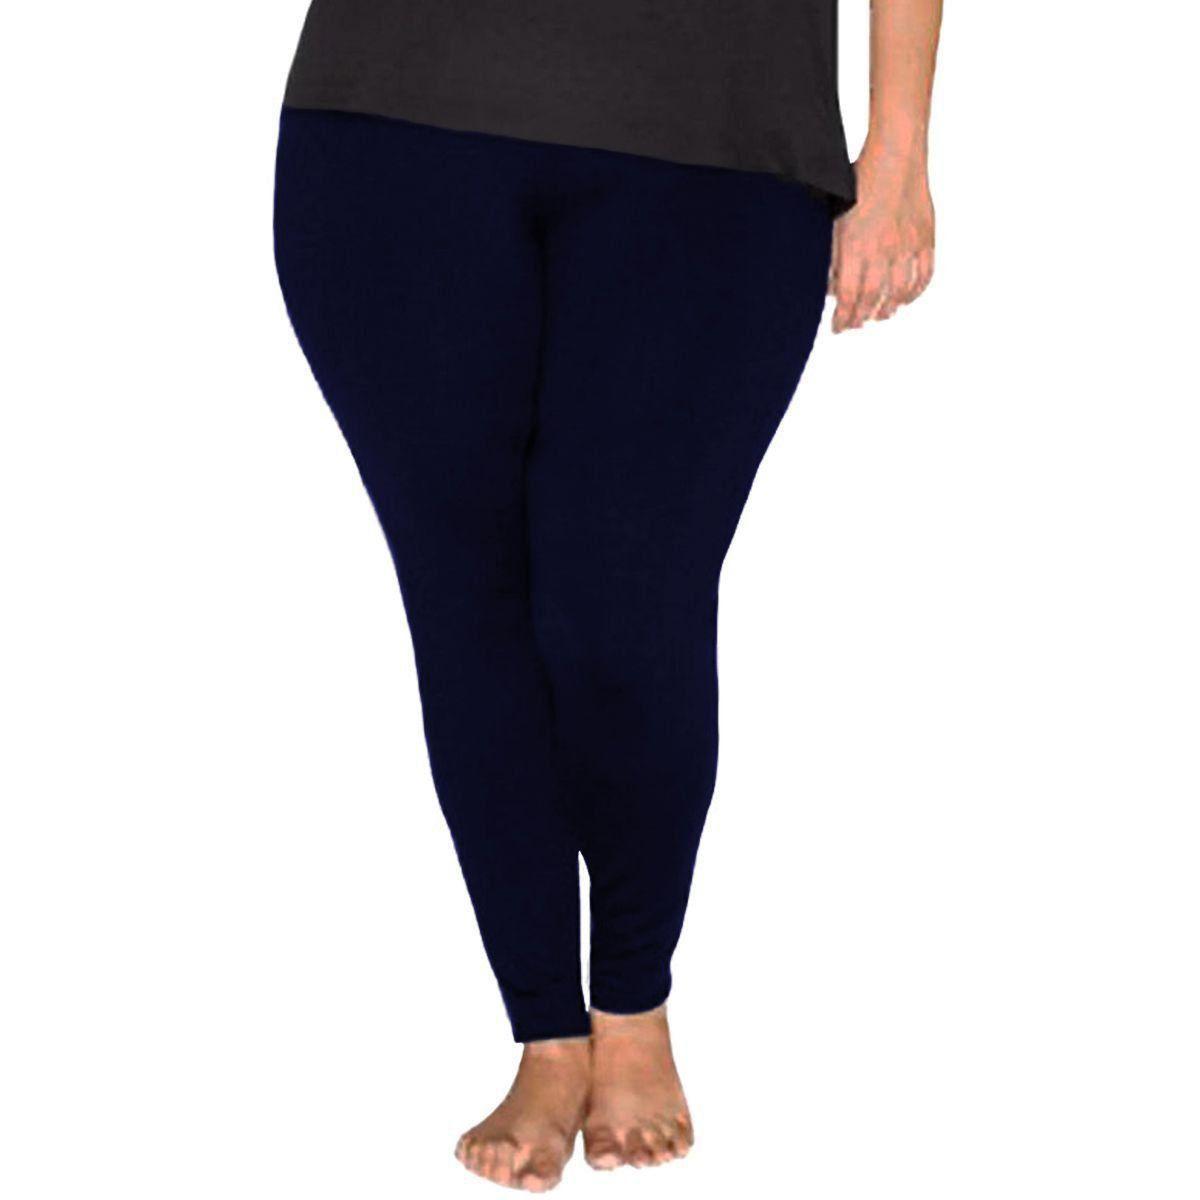 31928e12a0f5 Calça legging plus size peluciada térmica suplex Dicors R$ 49,88 à vista.  Adicionar à sacola